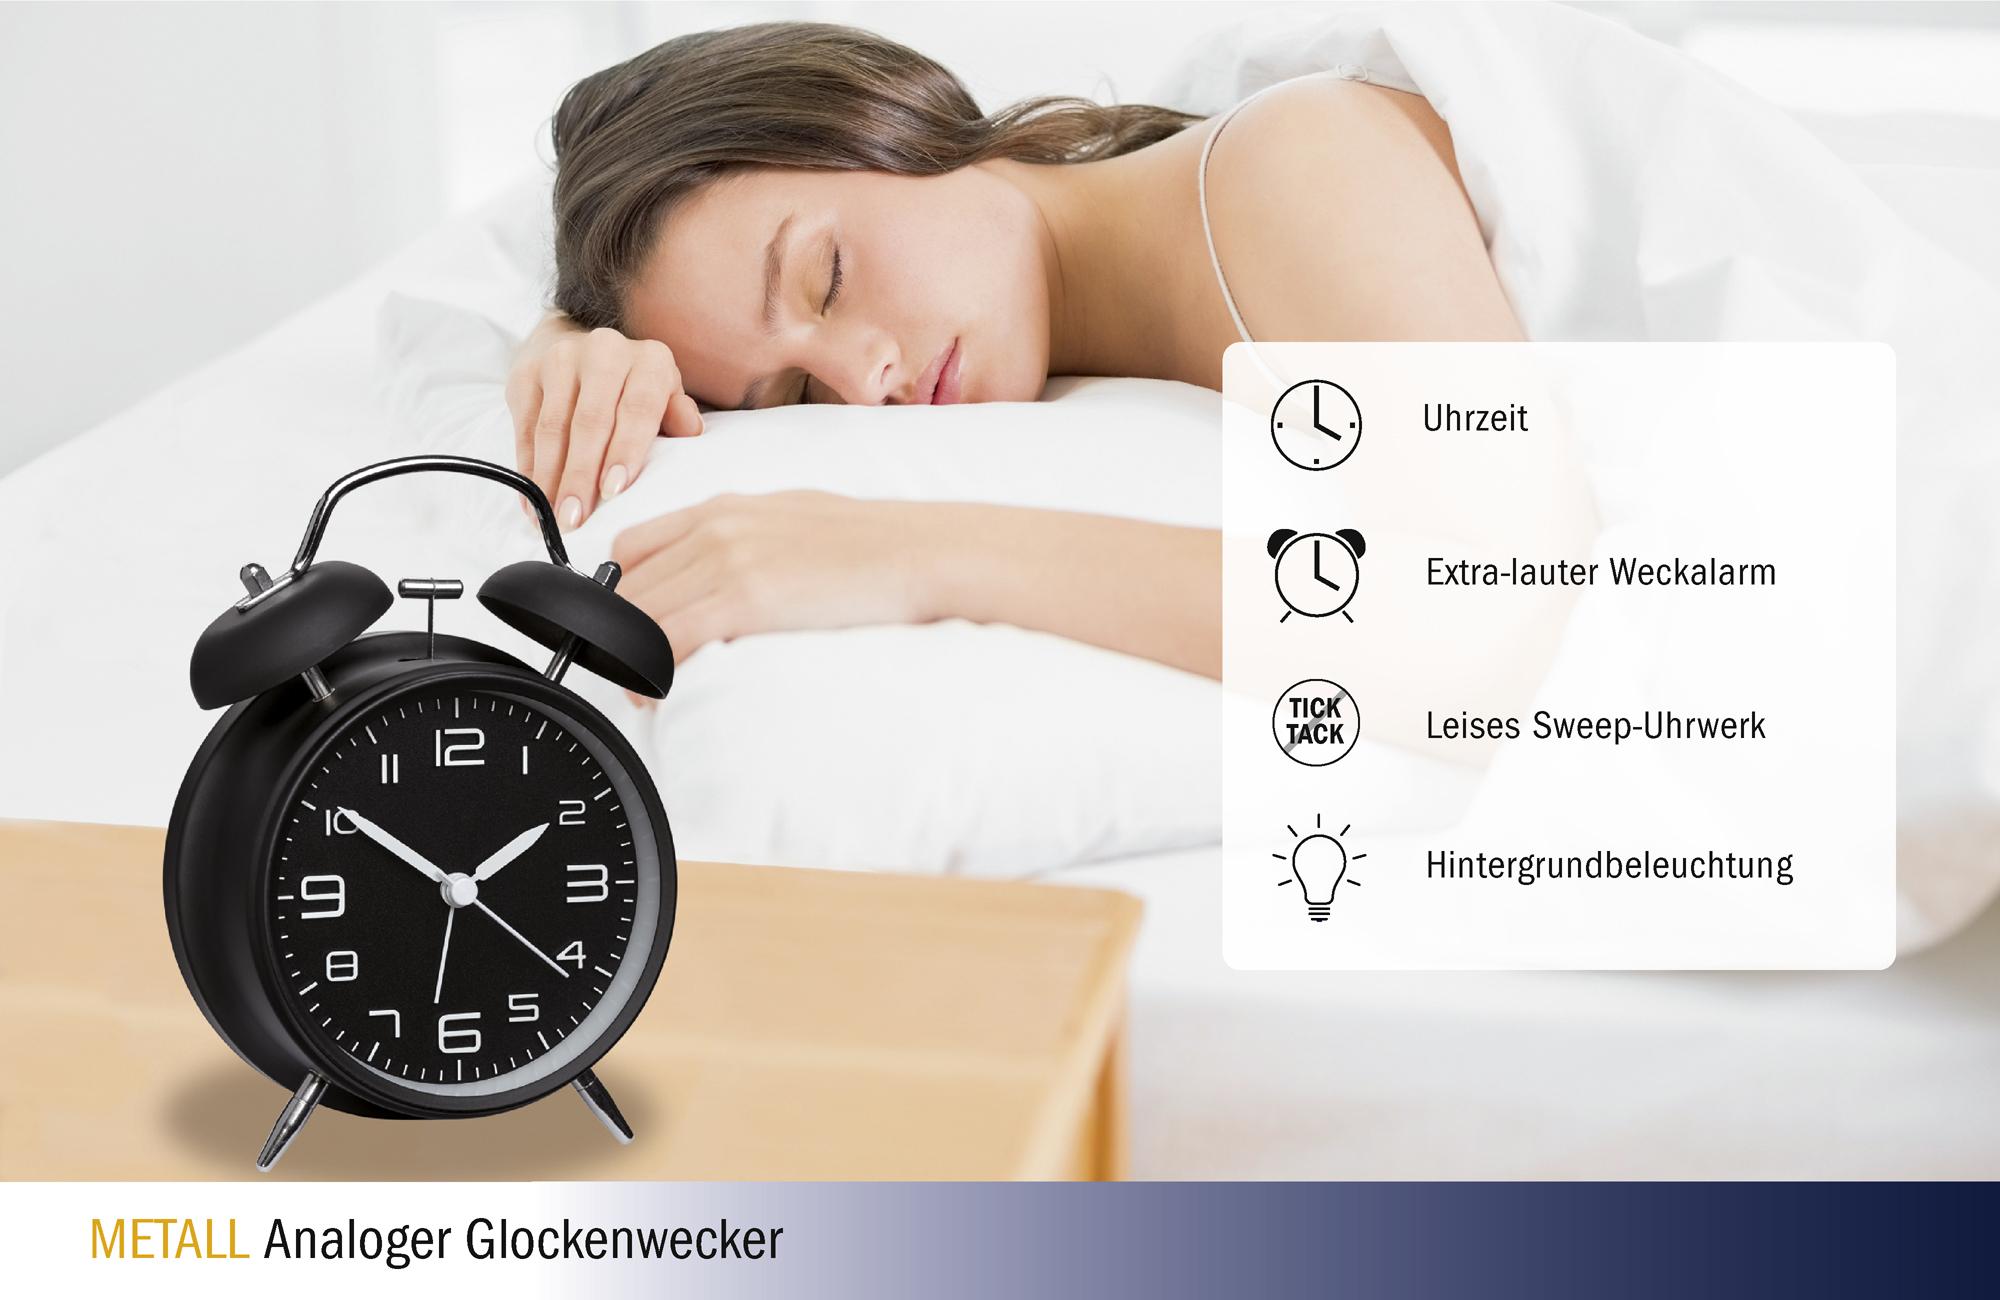 Doppelglockenwecker_Analoger Wecker_ lauter Alarm_601025_Icons.jpg